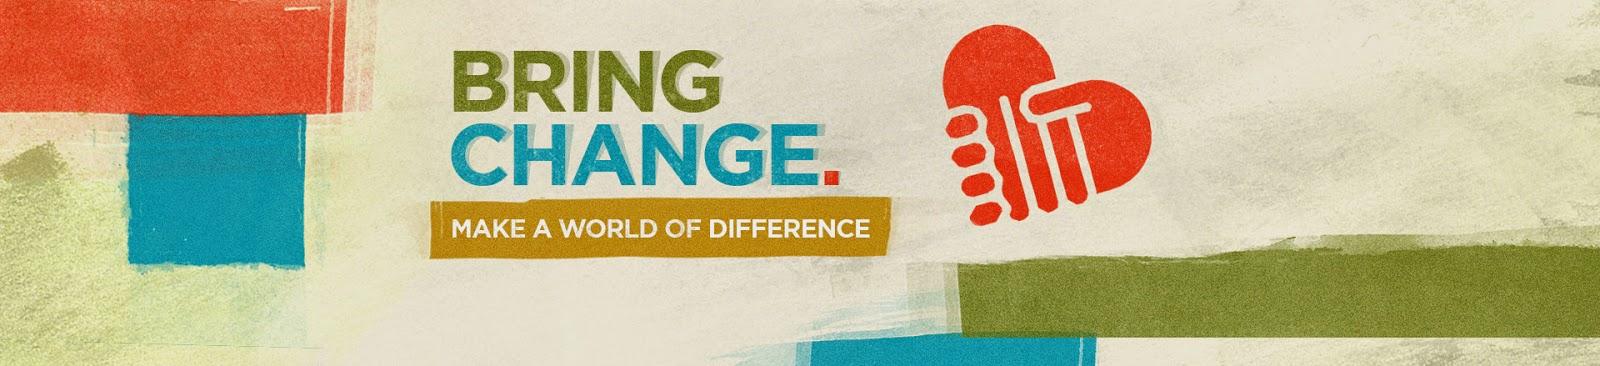 http://imaginenomalaria.org/page/bring-change